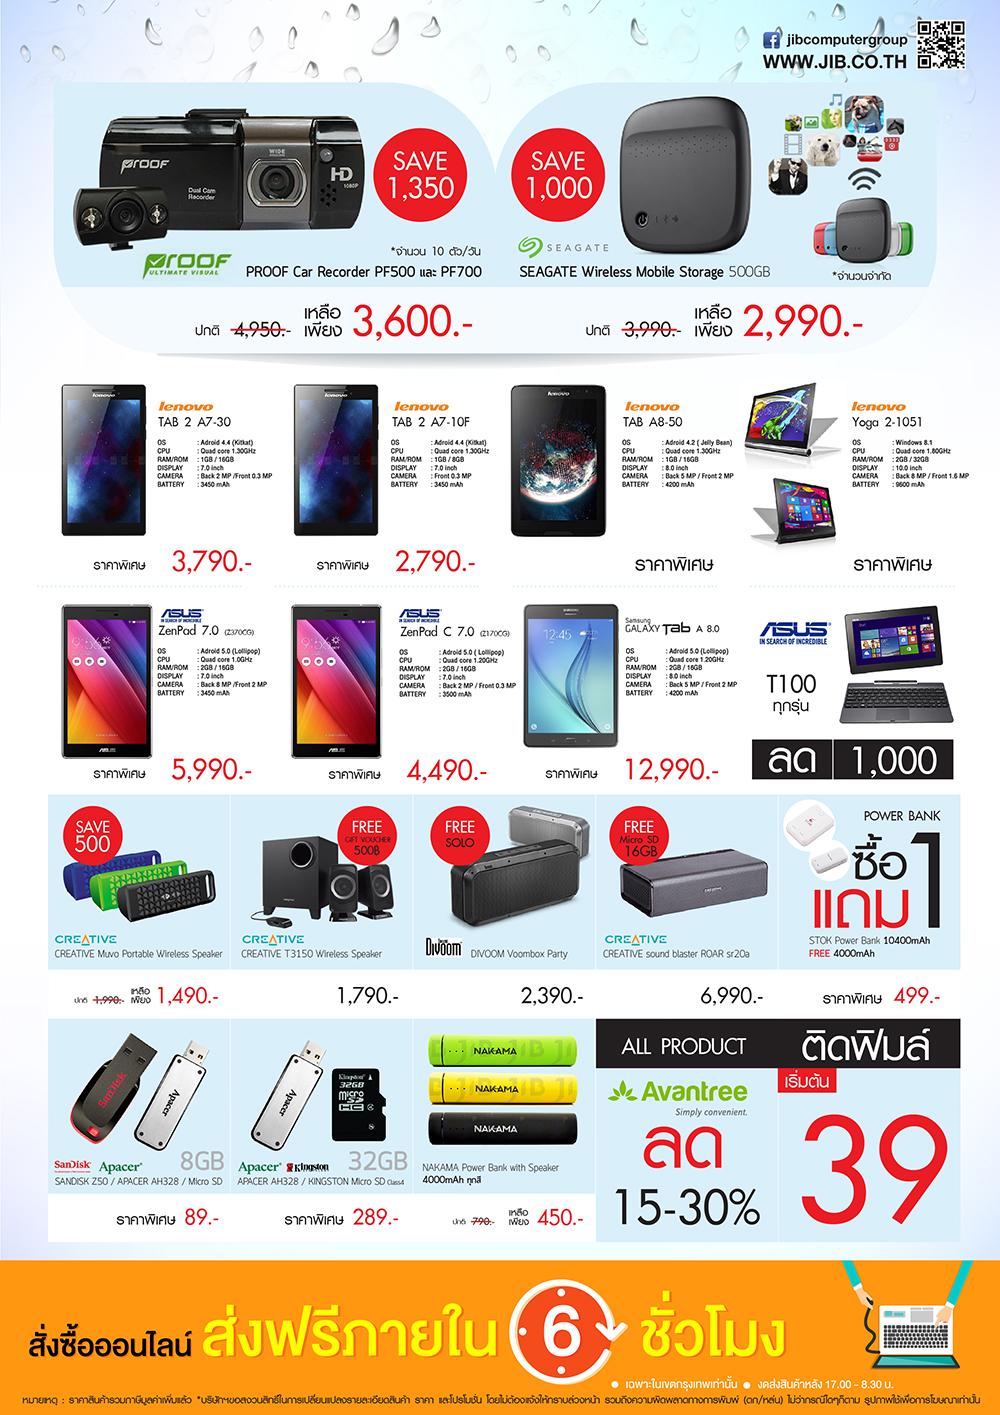 Brochure-Mobile-กันยายน-2558-02